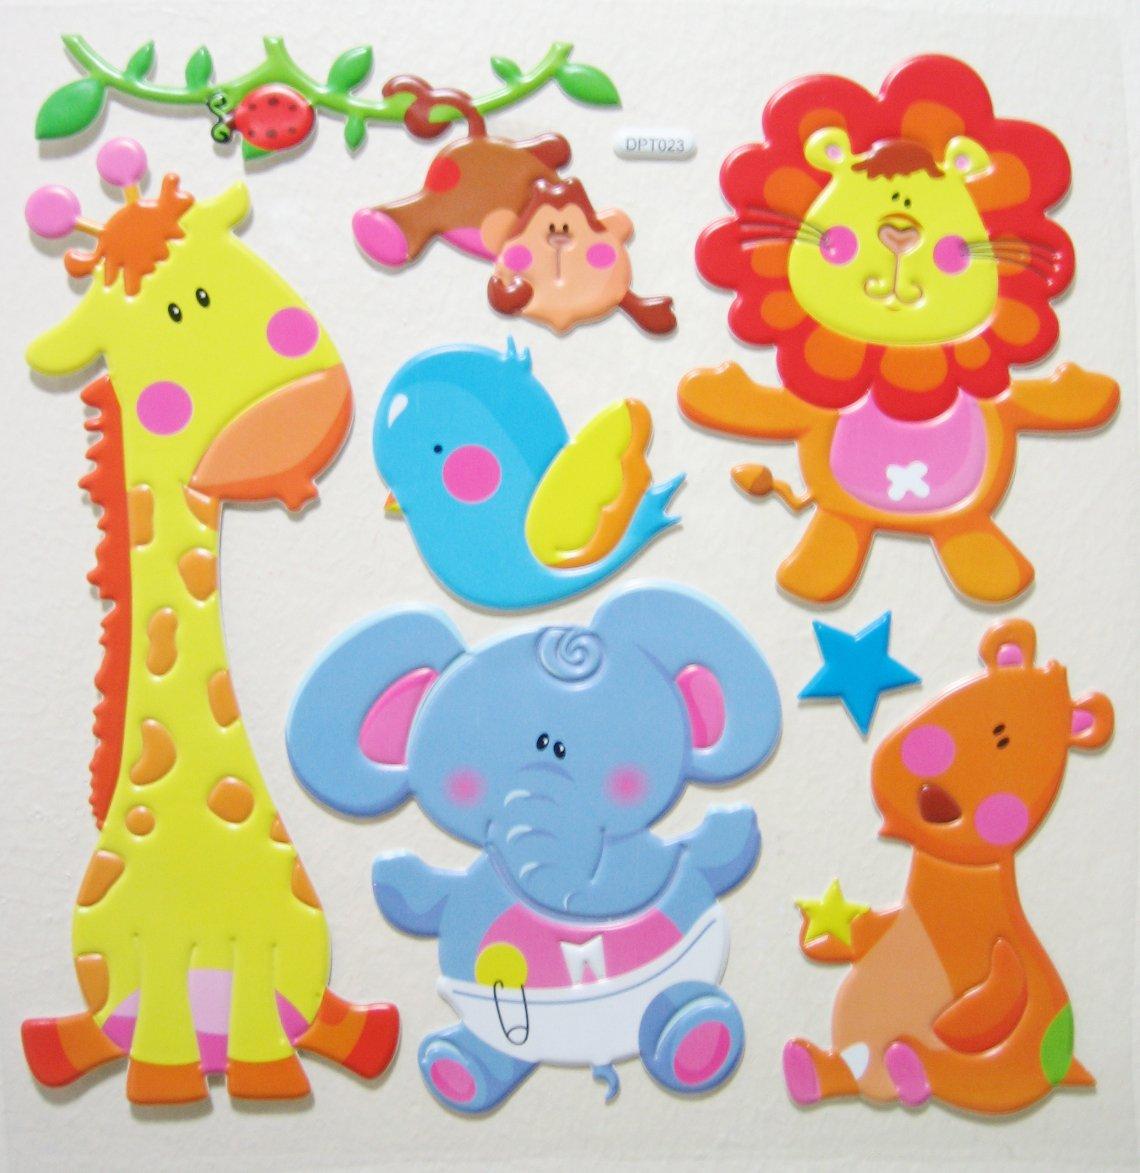 Big 3D BABY ANIMALS Wall Sticker Kid Room Decor